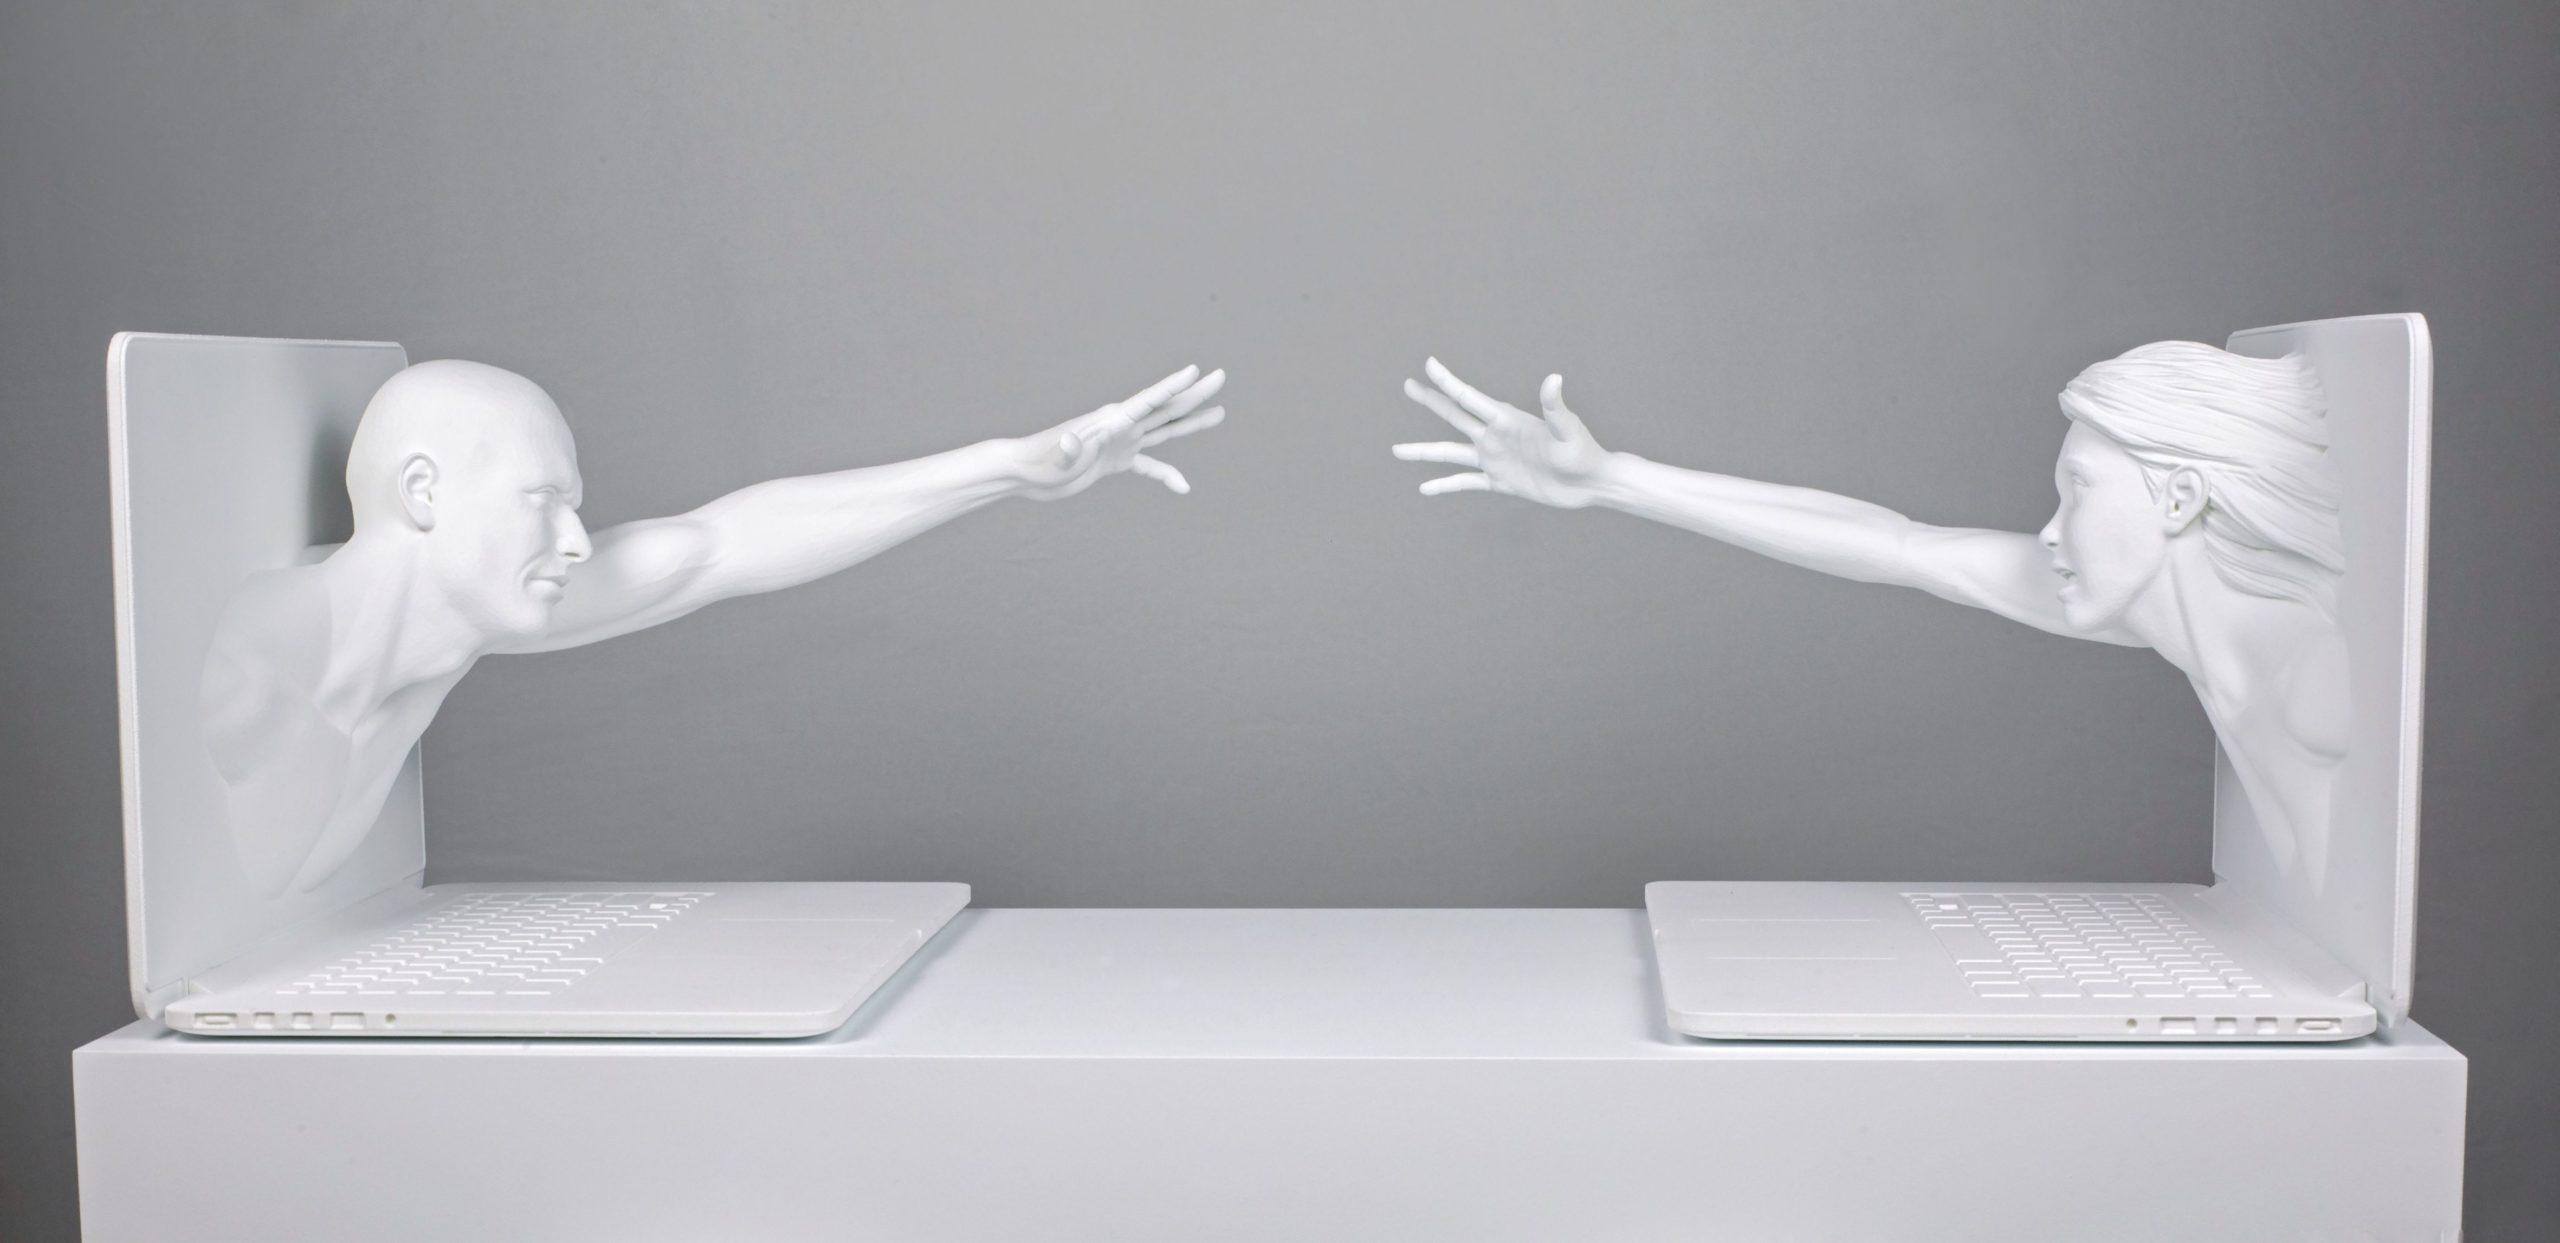 Tecnologia e arte si incontrano a Milano: Federico Clapis presenta #deepscrolling